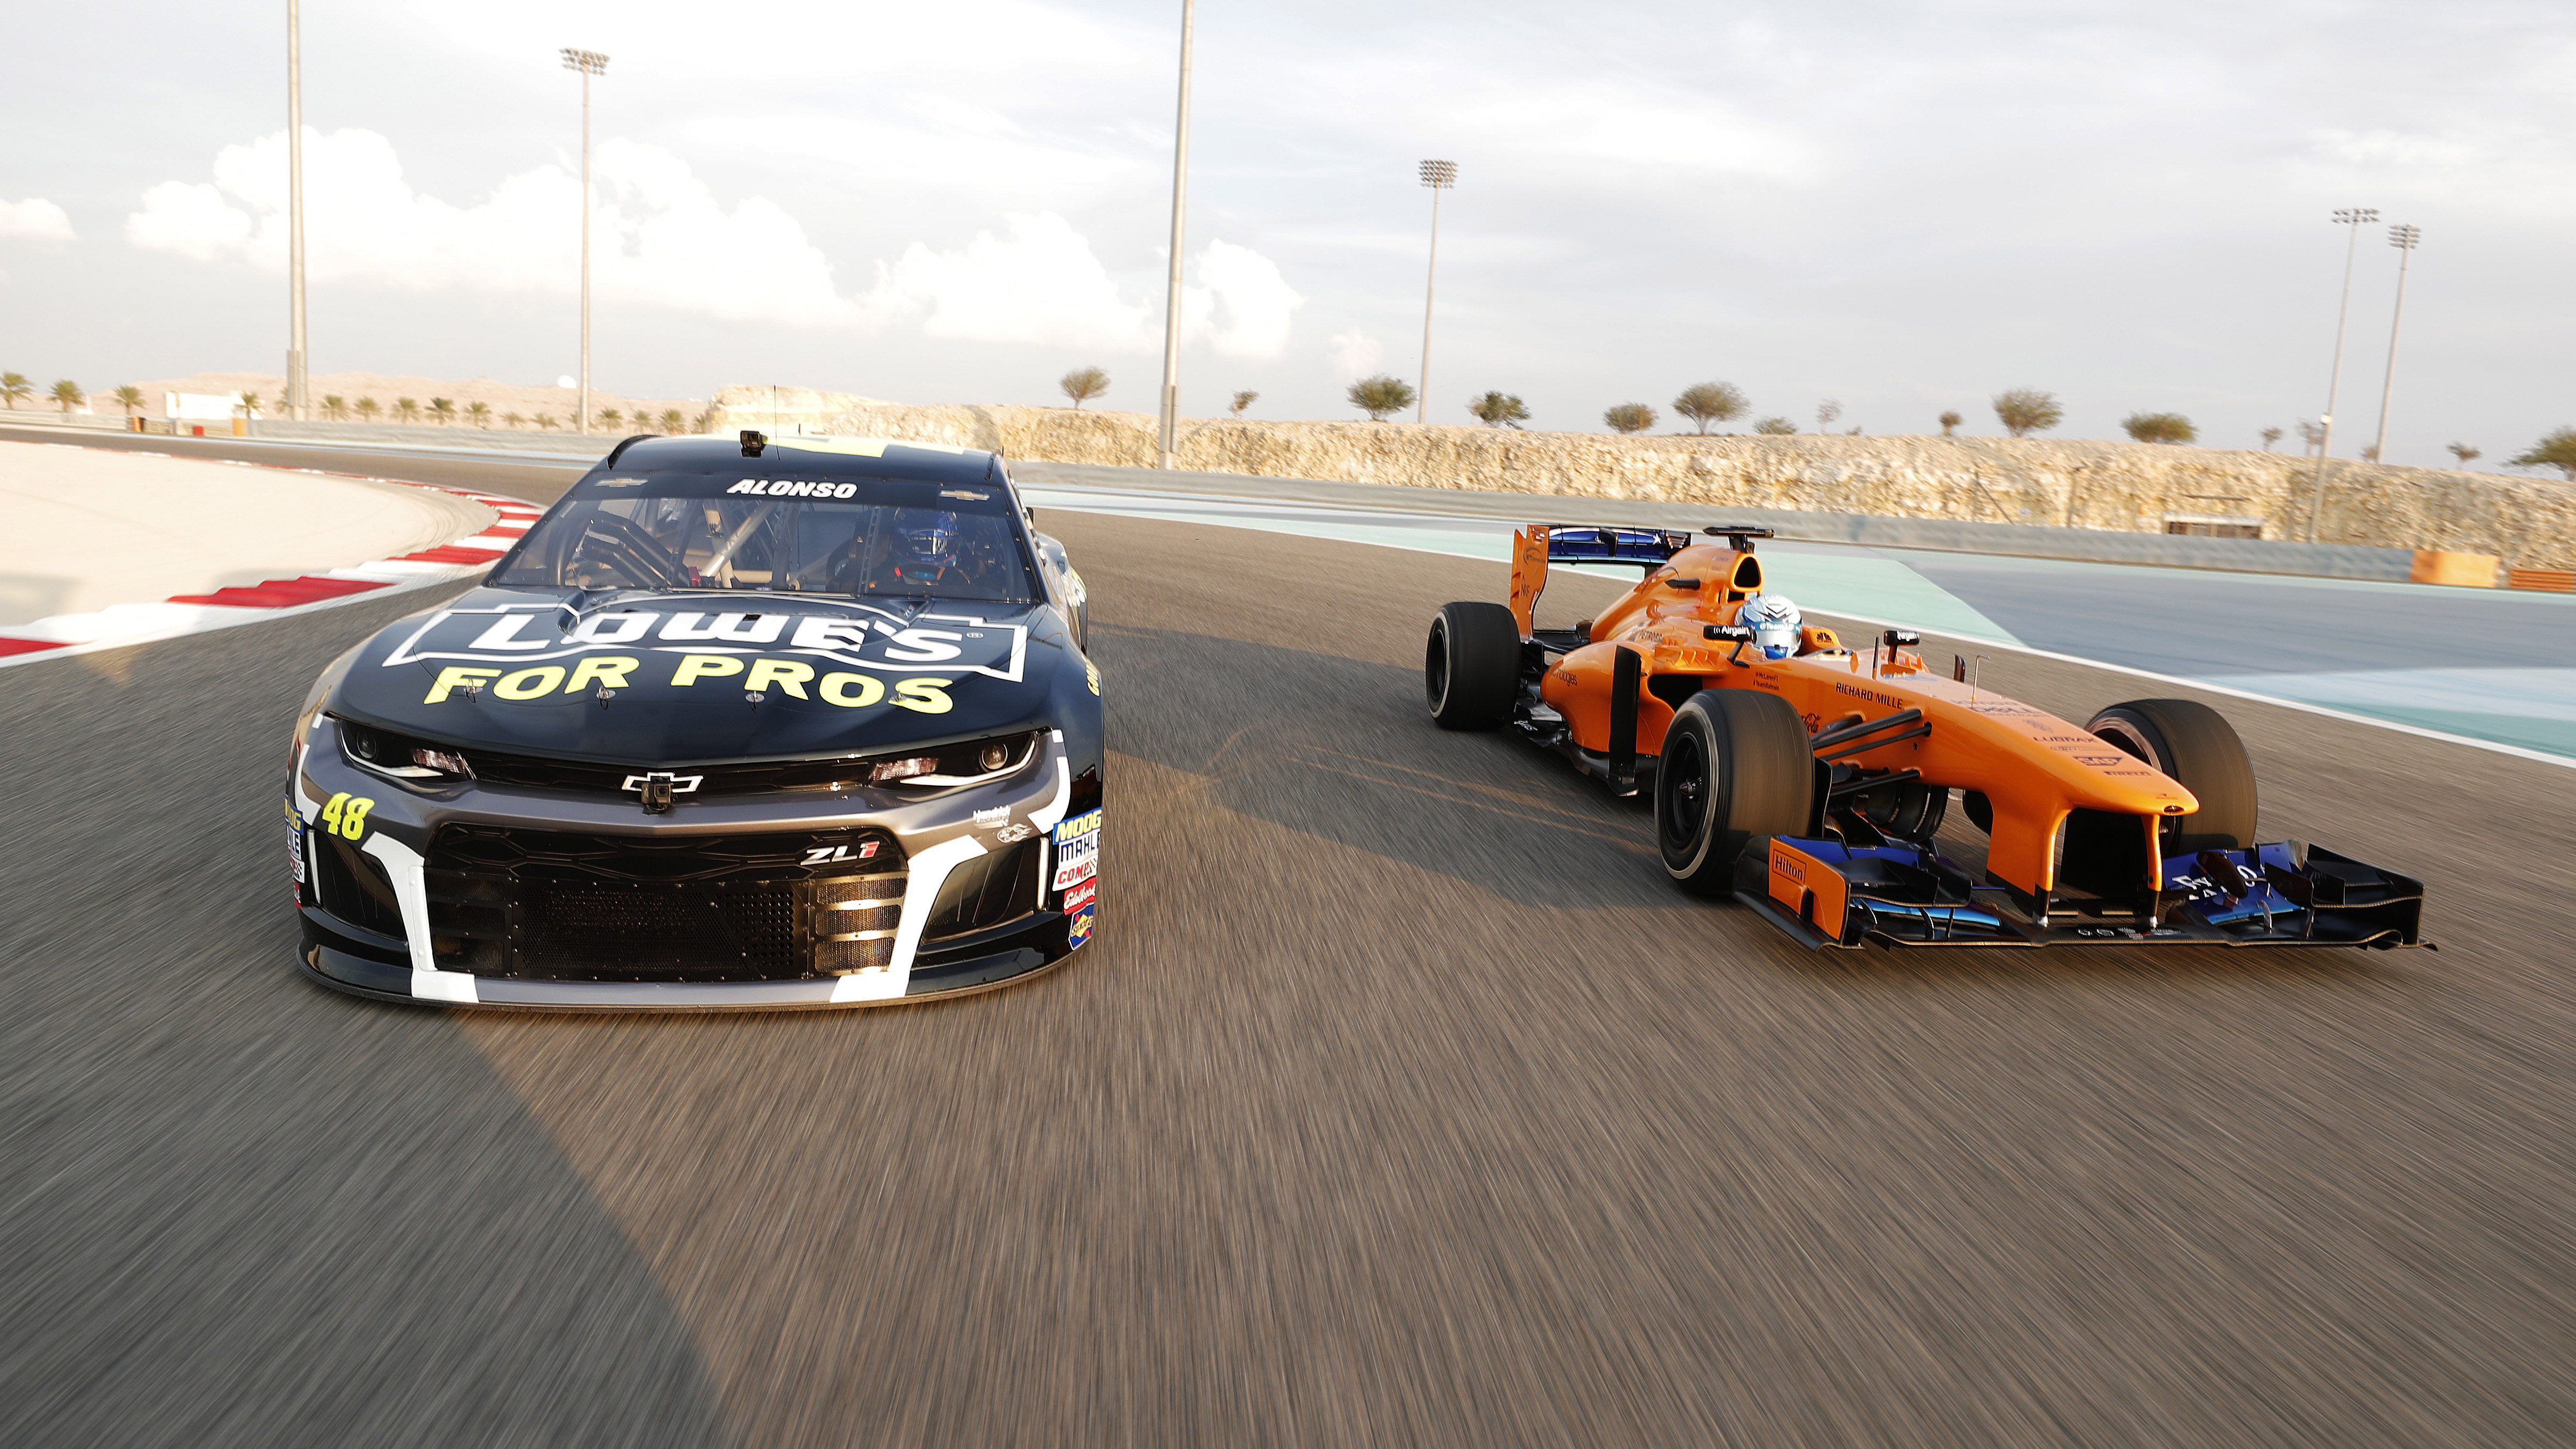 Fernando Alonso and NASCAR racer Jimmie Johnson seat swap